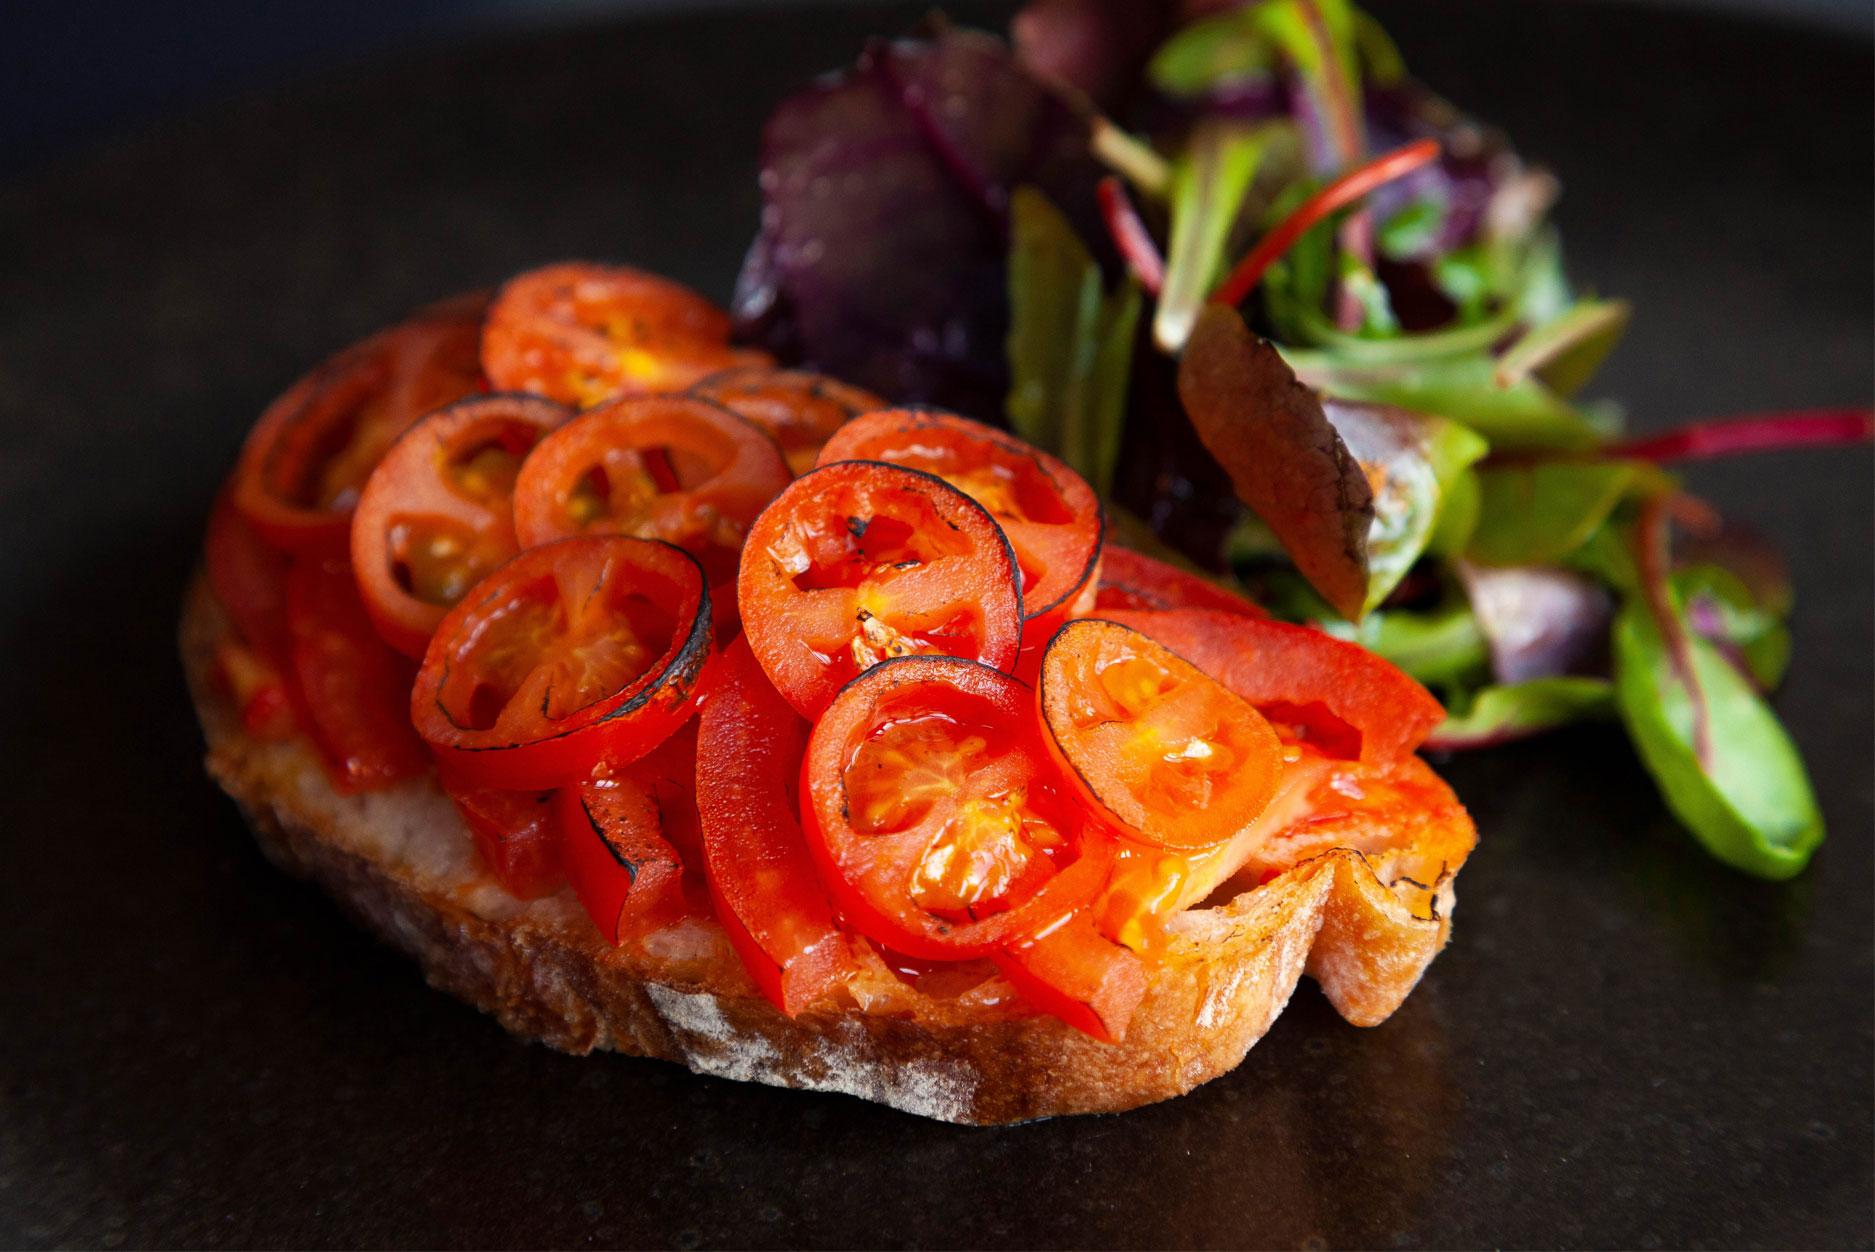 Tomatoes on sourdough